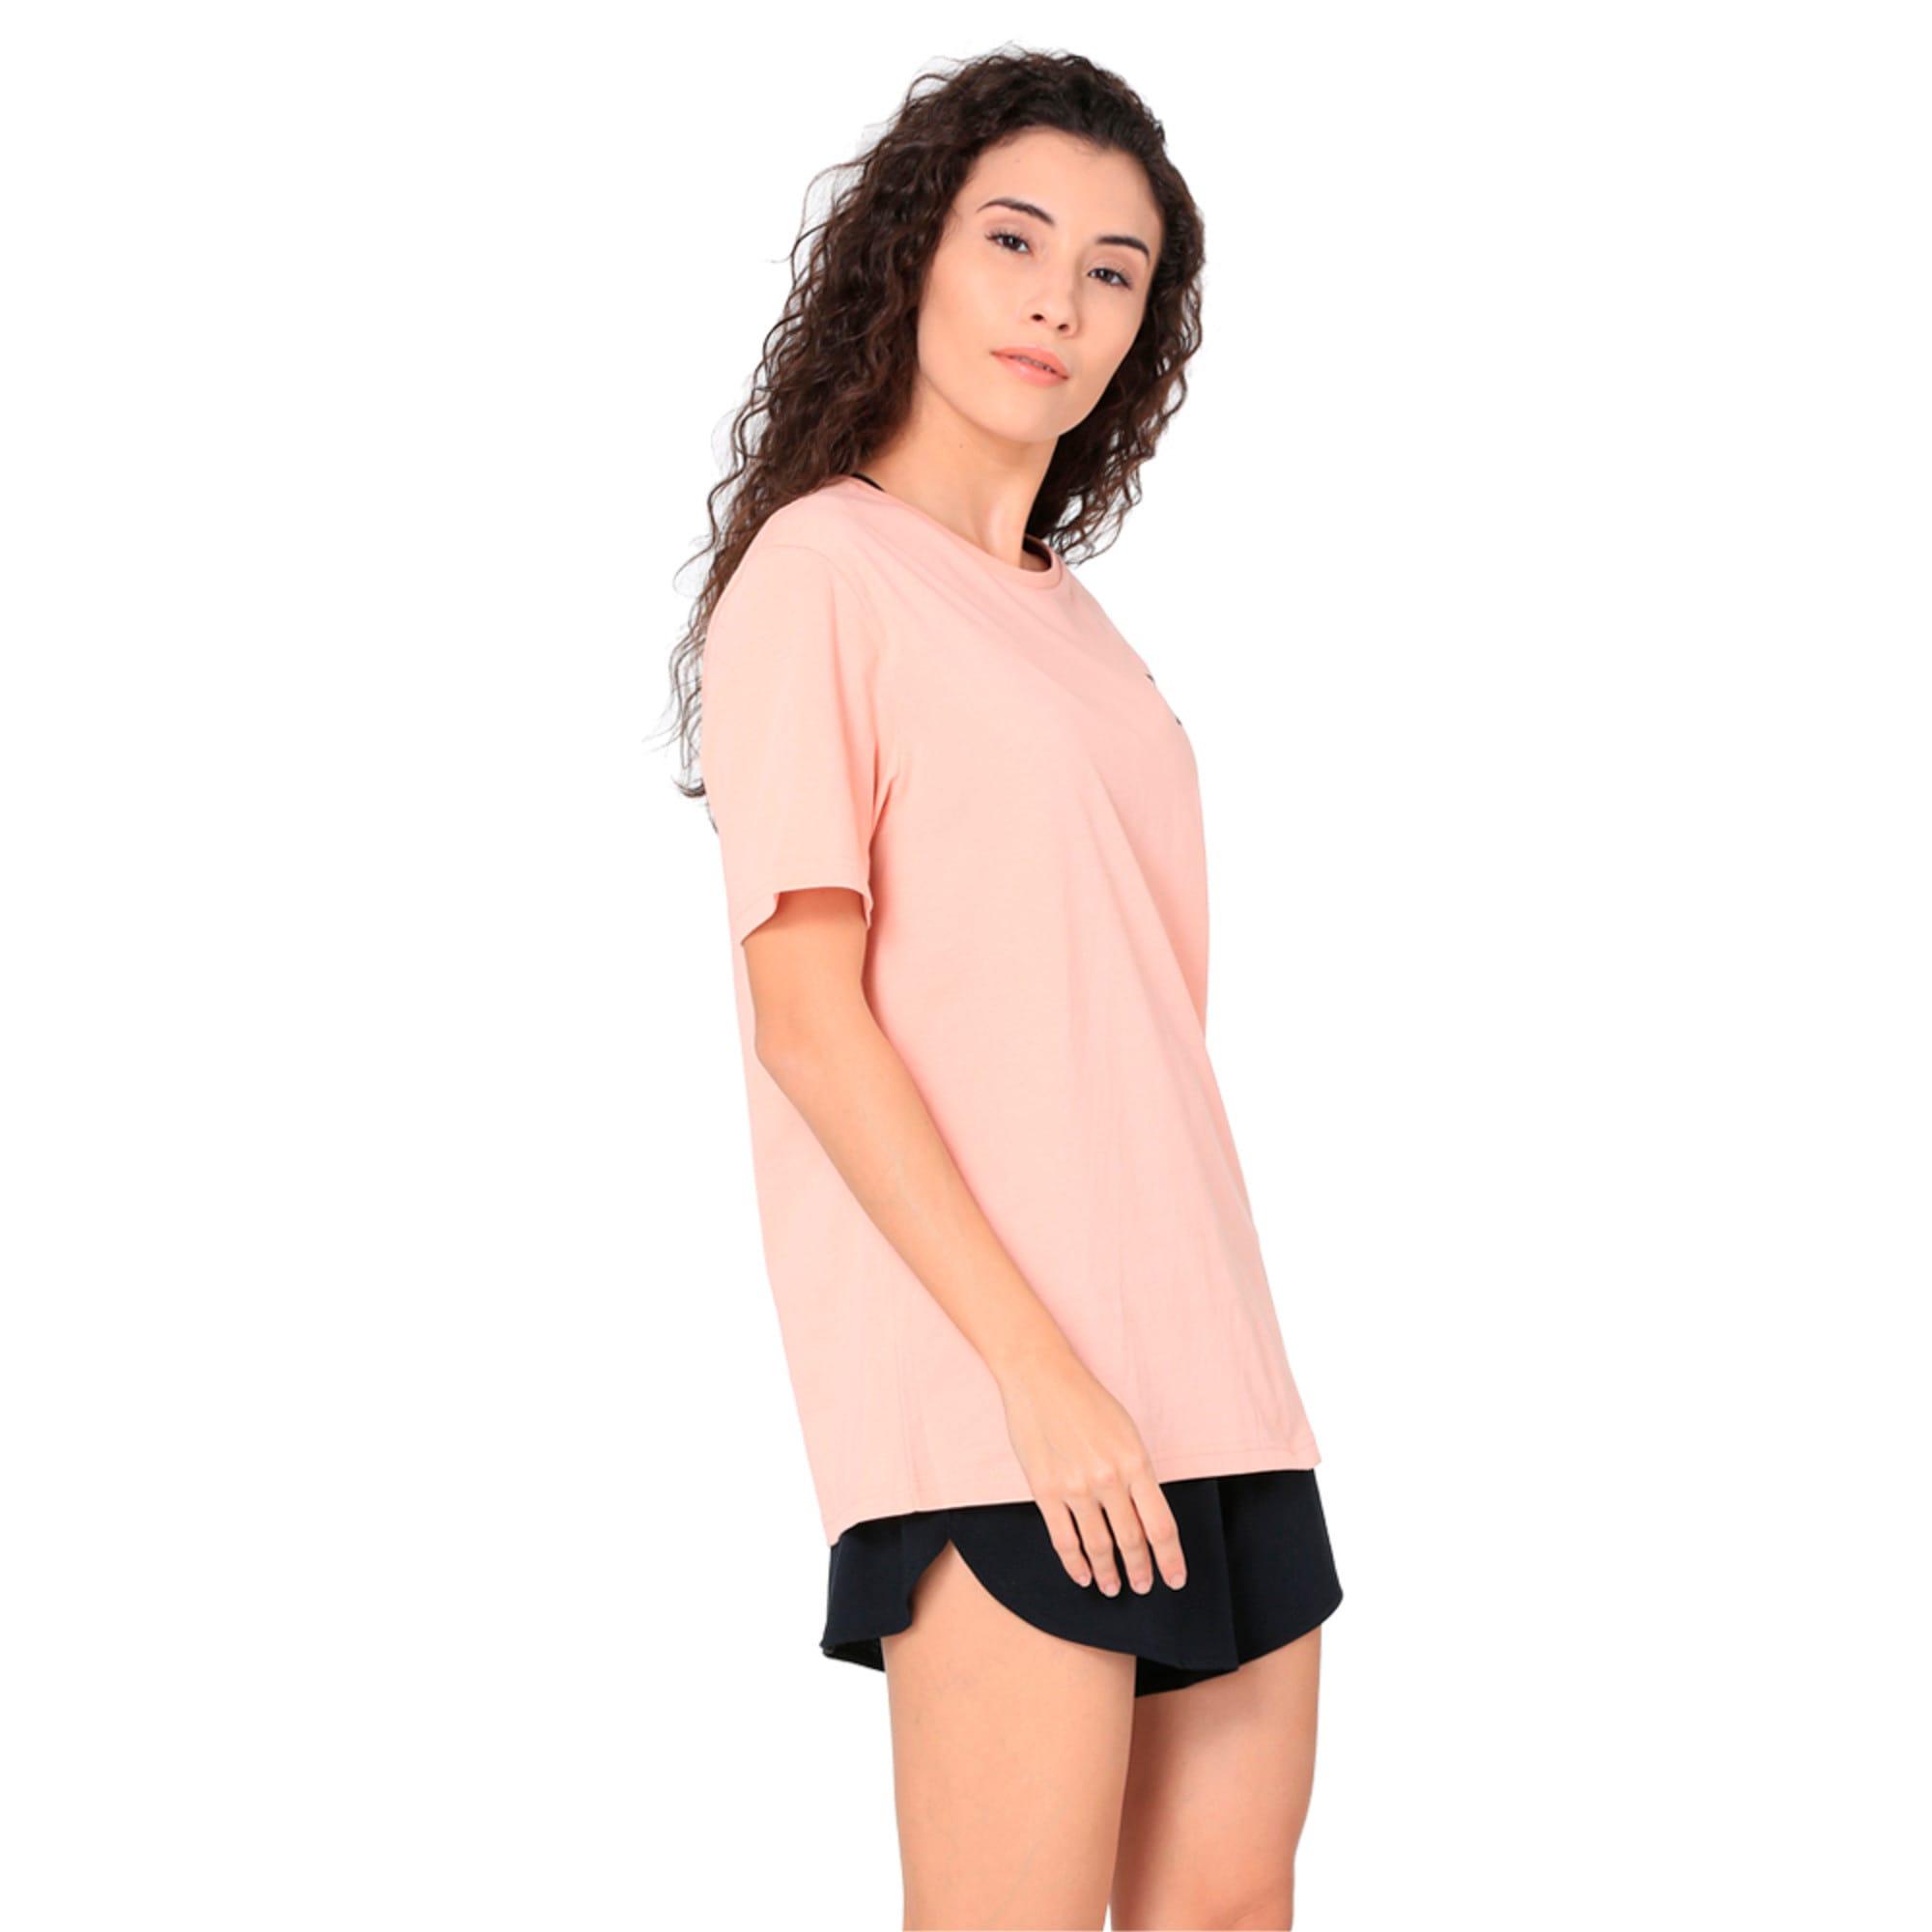 Thumbnail 5 of Women's Graphic T-shirt, Peach Beige, medium-IND